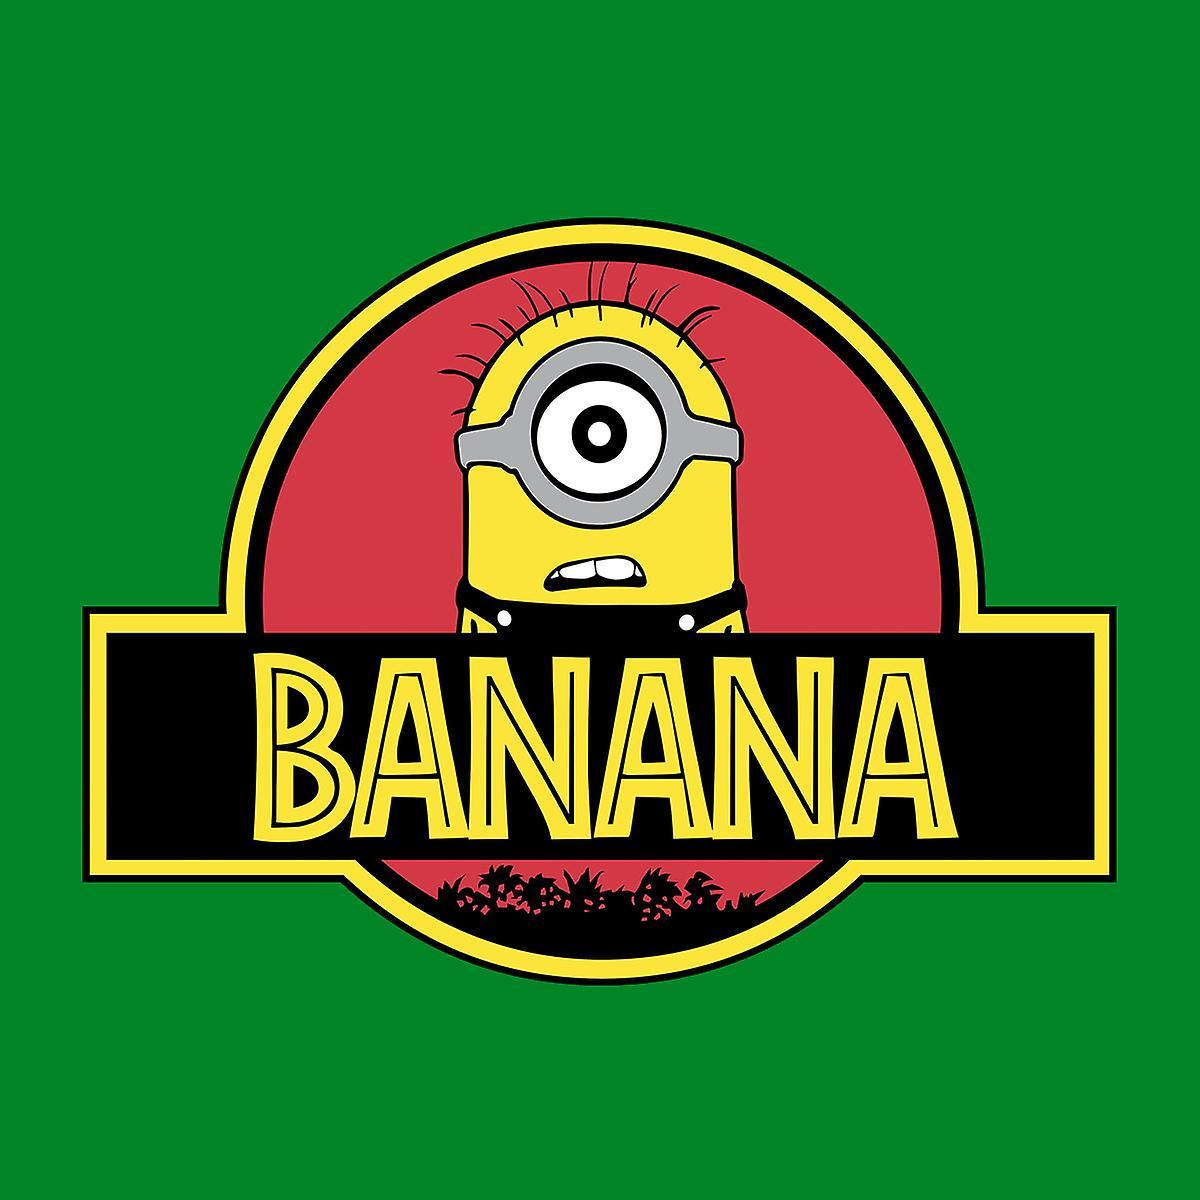 Minions Jurassic Park Banana Men's Hooded Sweatshirt